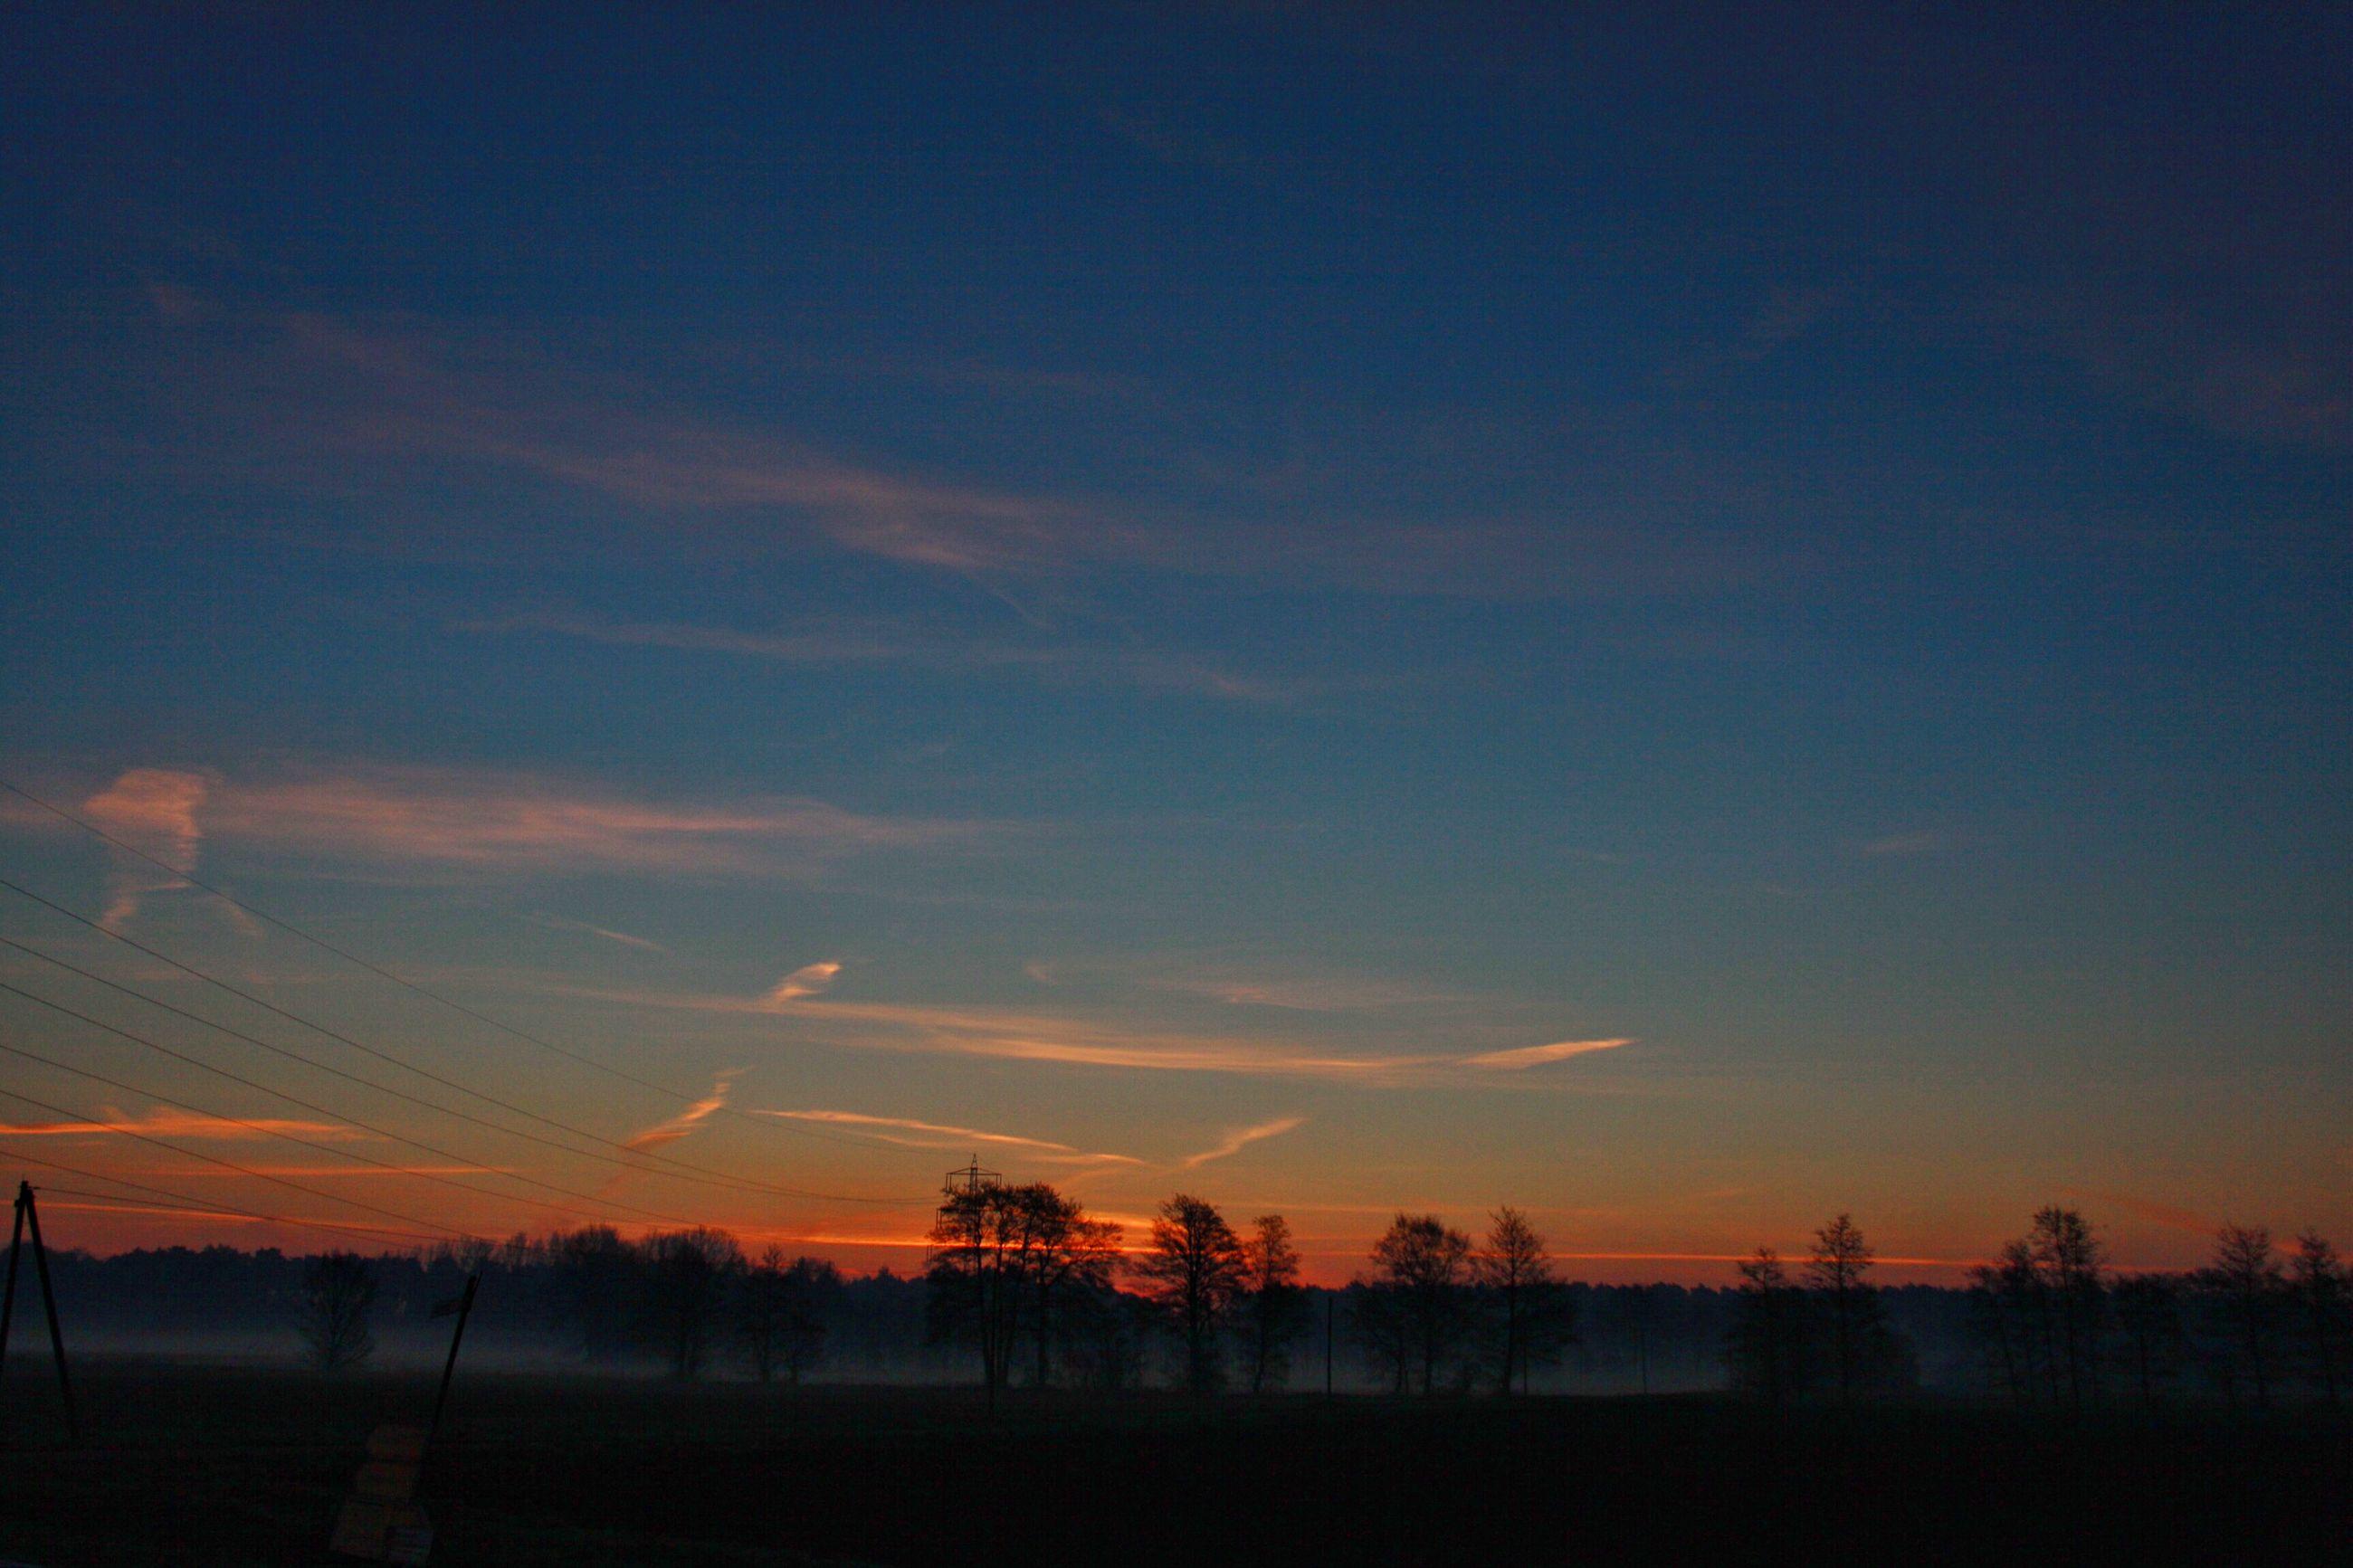 sunset, tranquil scene, tranquility, silhouette, scenics, beauty in nature, sky, landscape, orange color, nature, tree, idyllic, field, dusk, non-urban scene, cloud - sky, outdoors, no people, lake, majestic